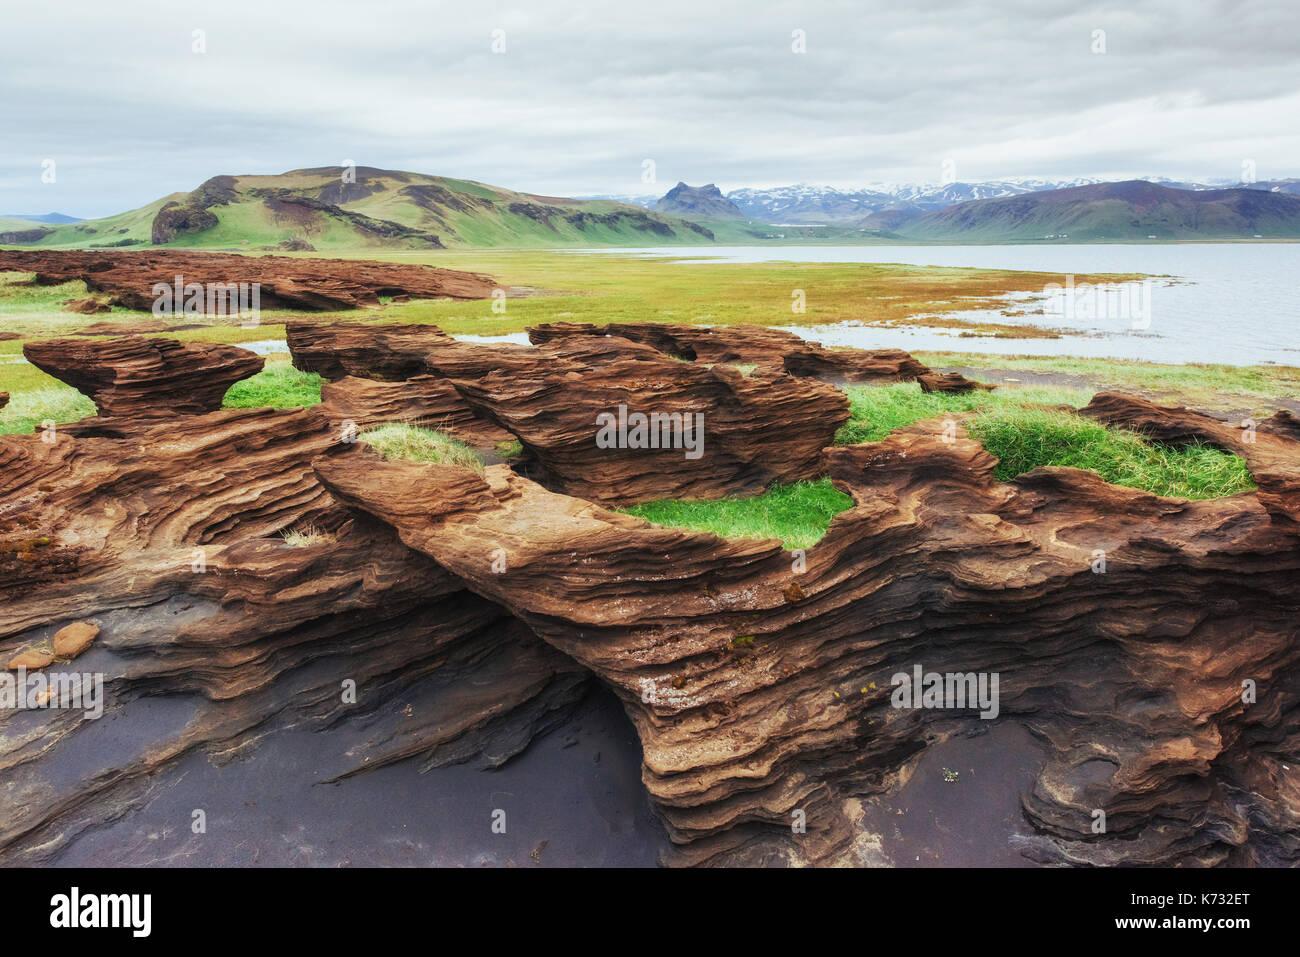 Malerischer Blick auf den vulkanischen Felsen in Island. Stockbild